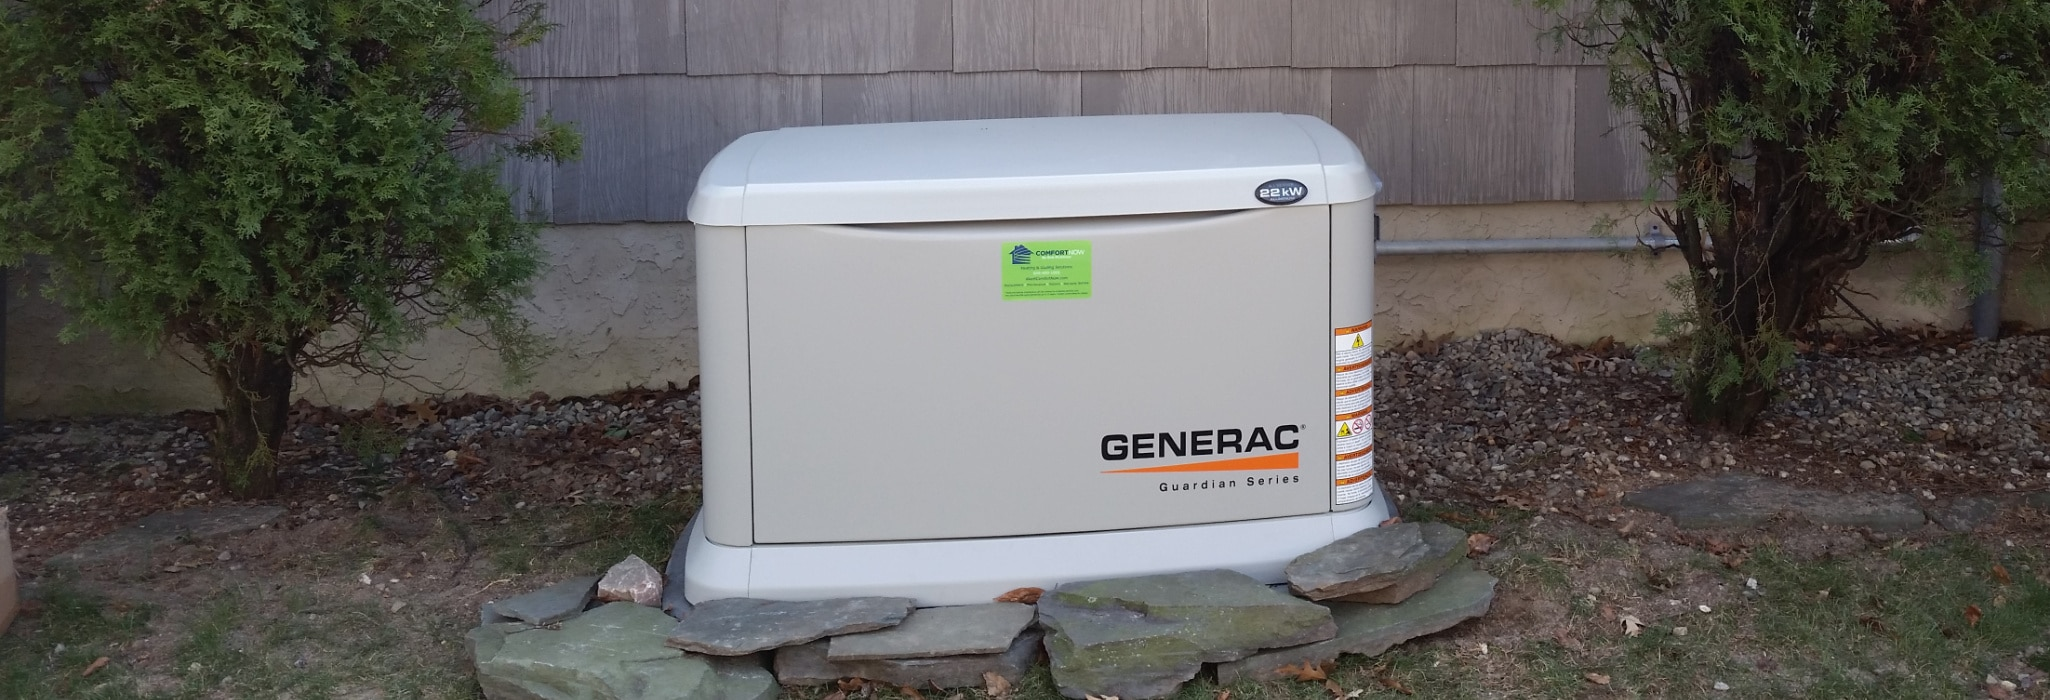 Whole house generator service.